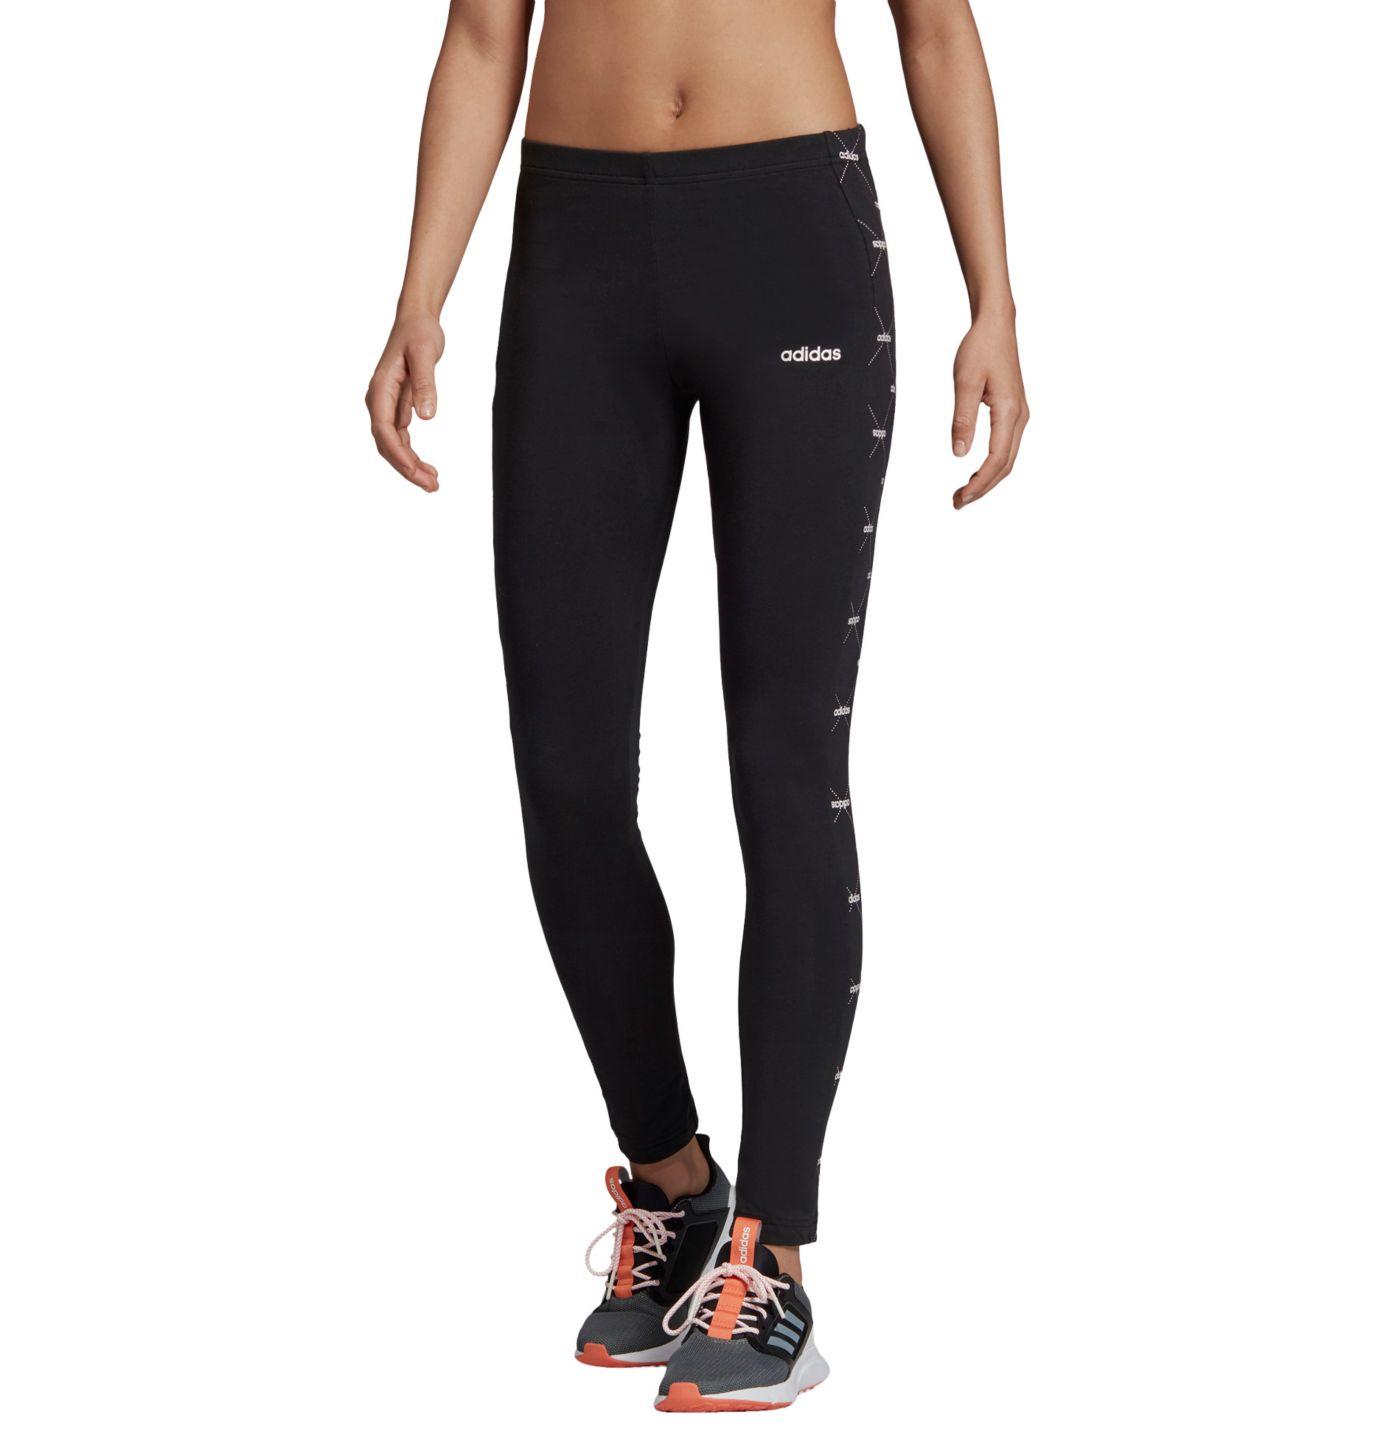 adidas Women's Core Favorites Linear Graphic Leggings